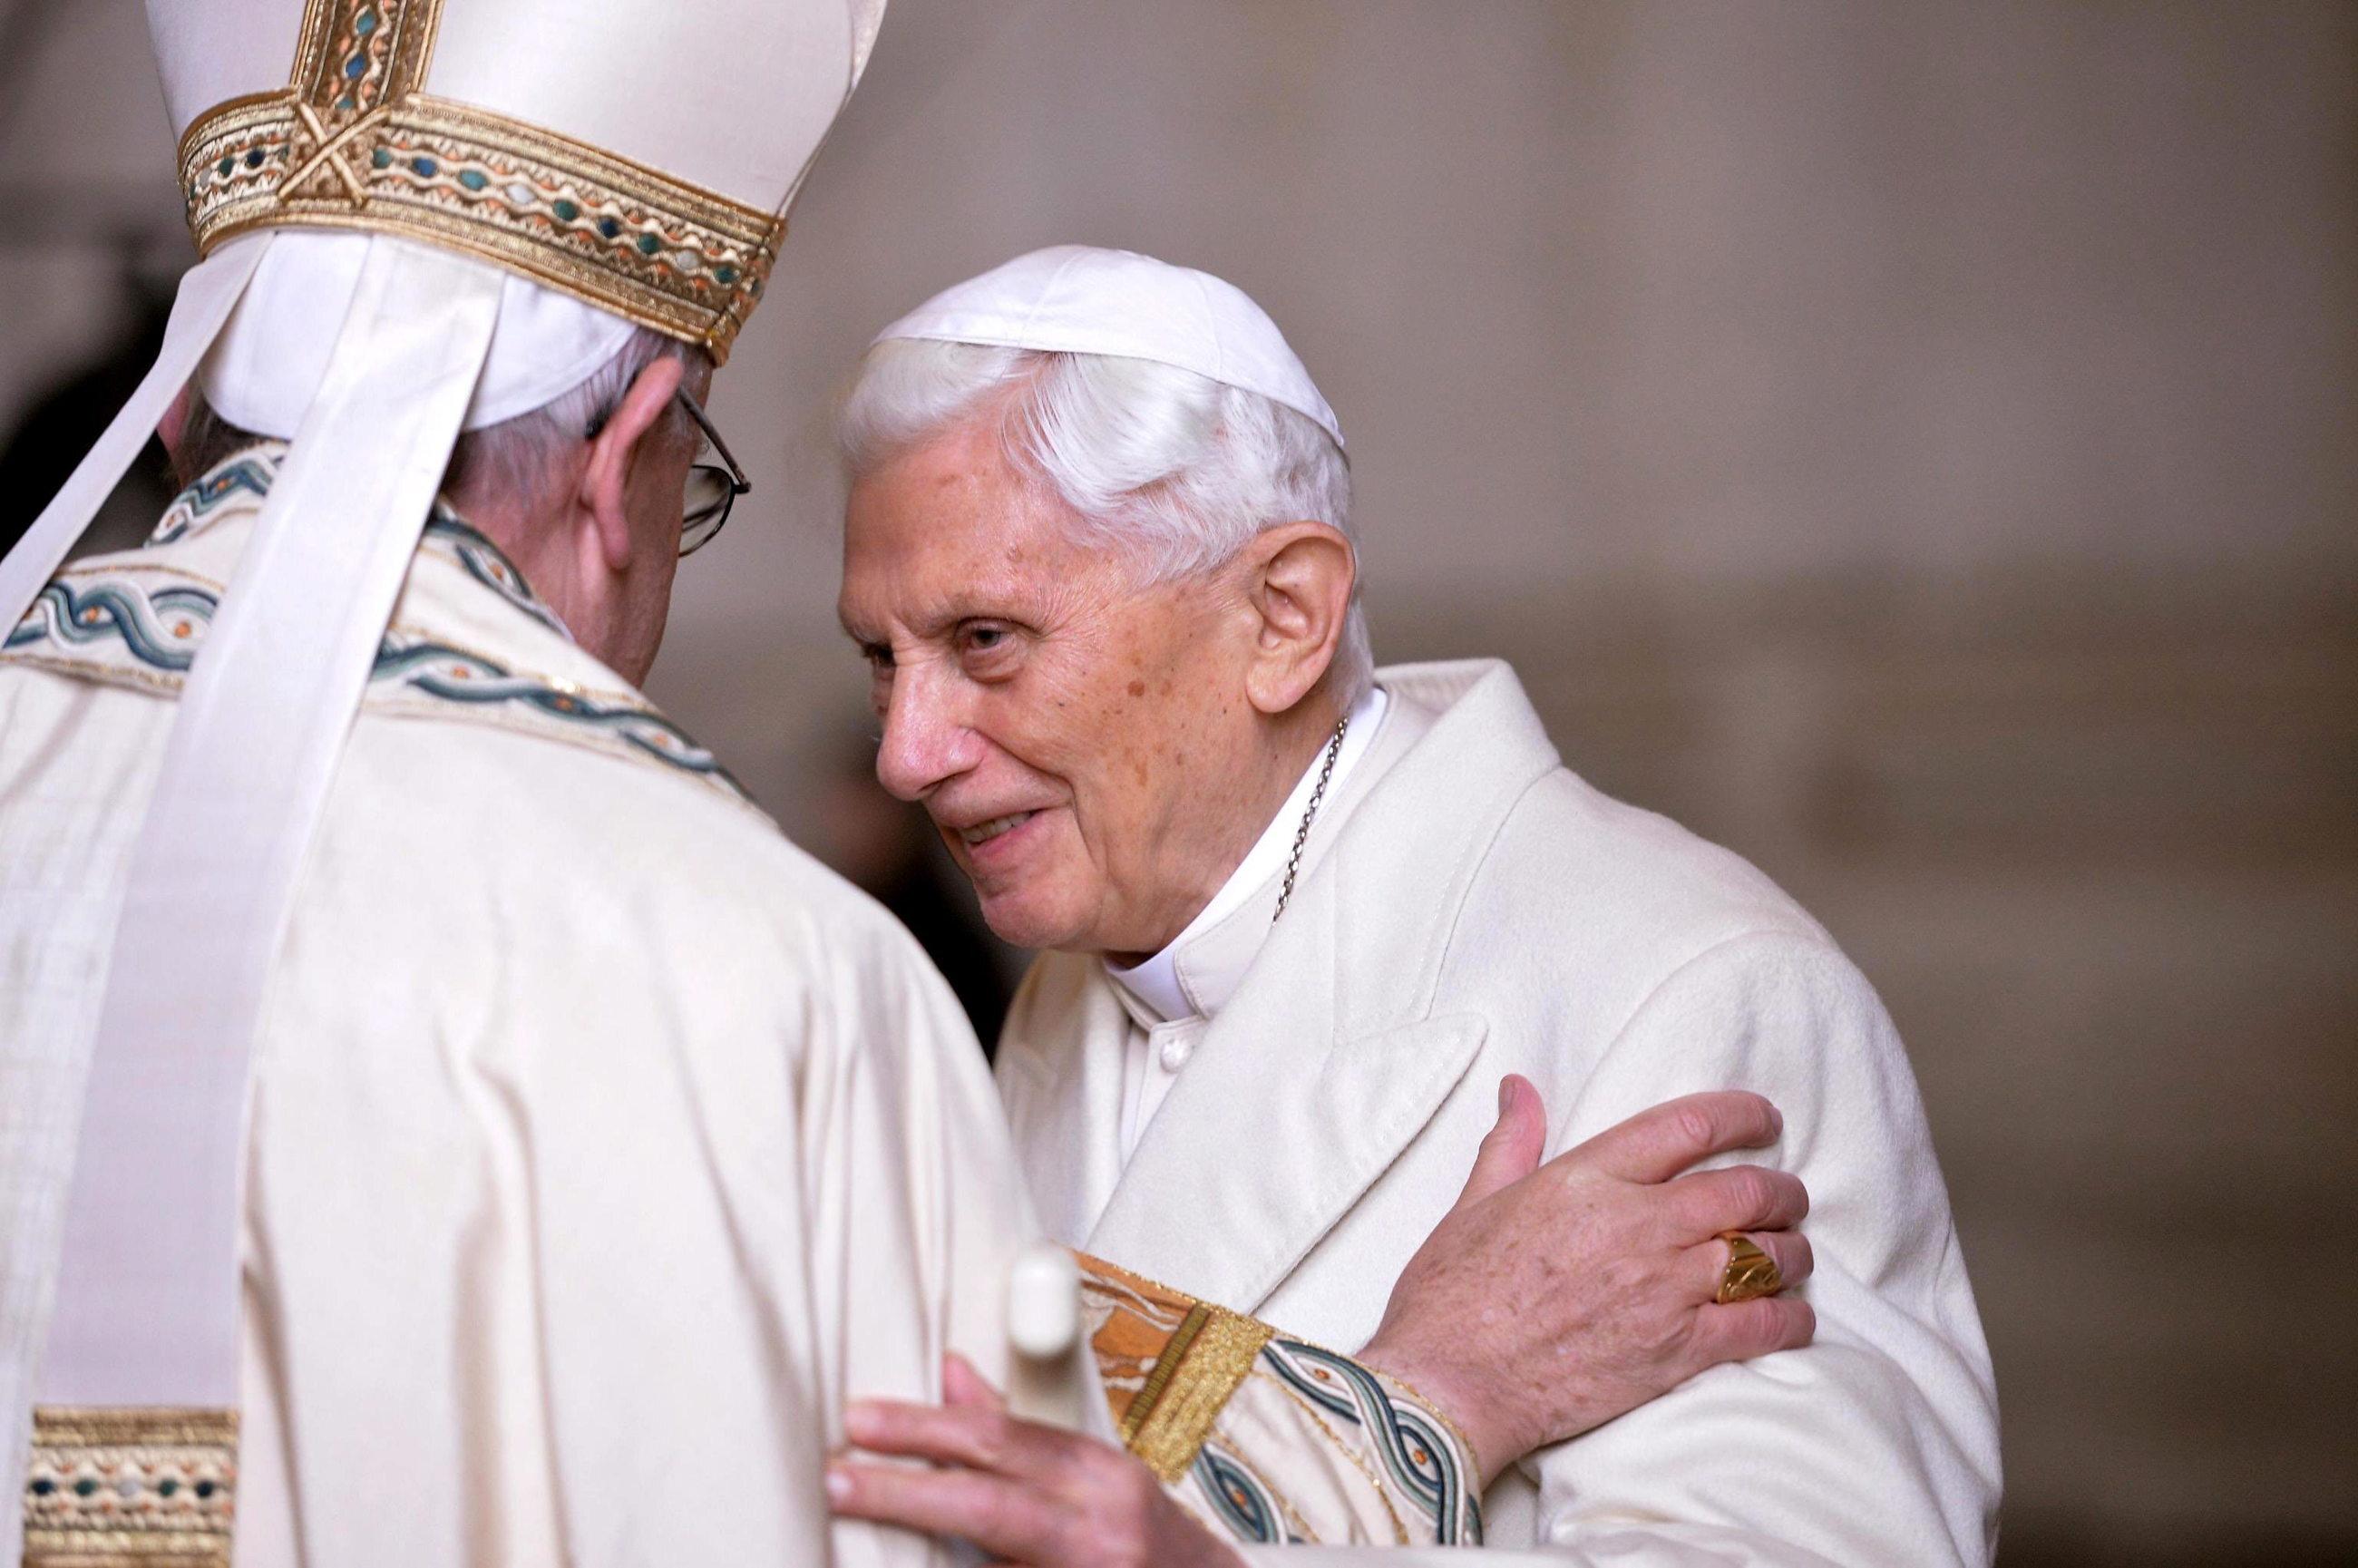 Papież Franciszek, papież senior Benedykt XVI